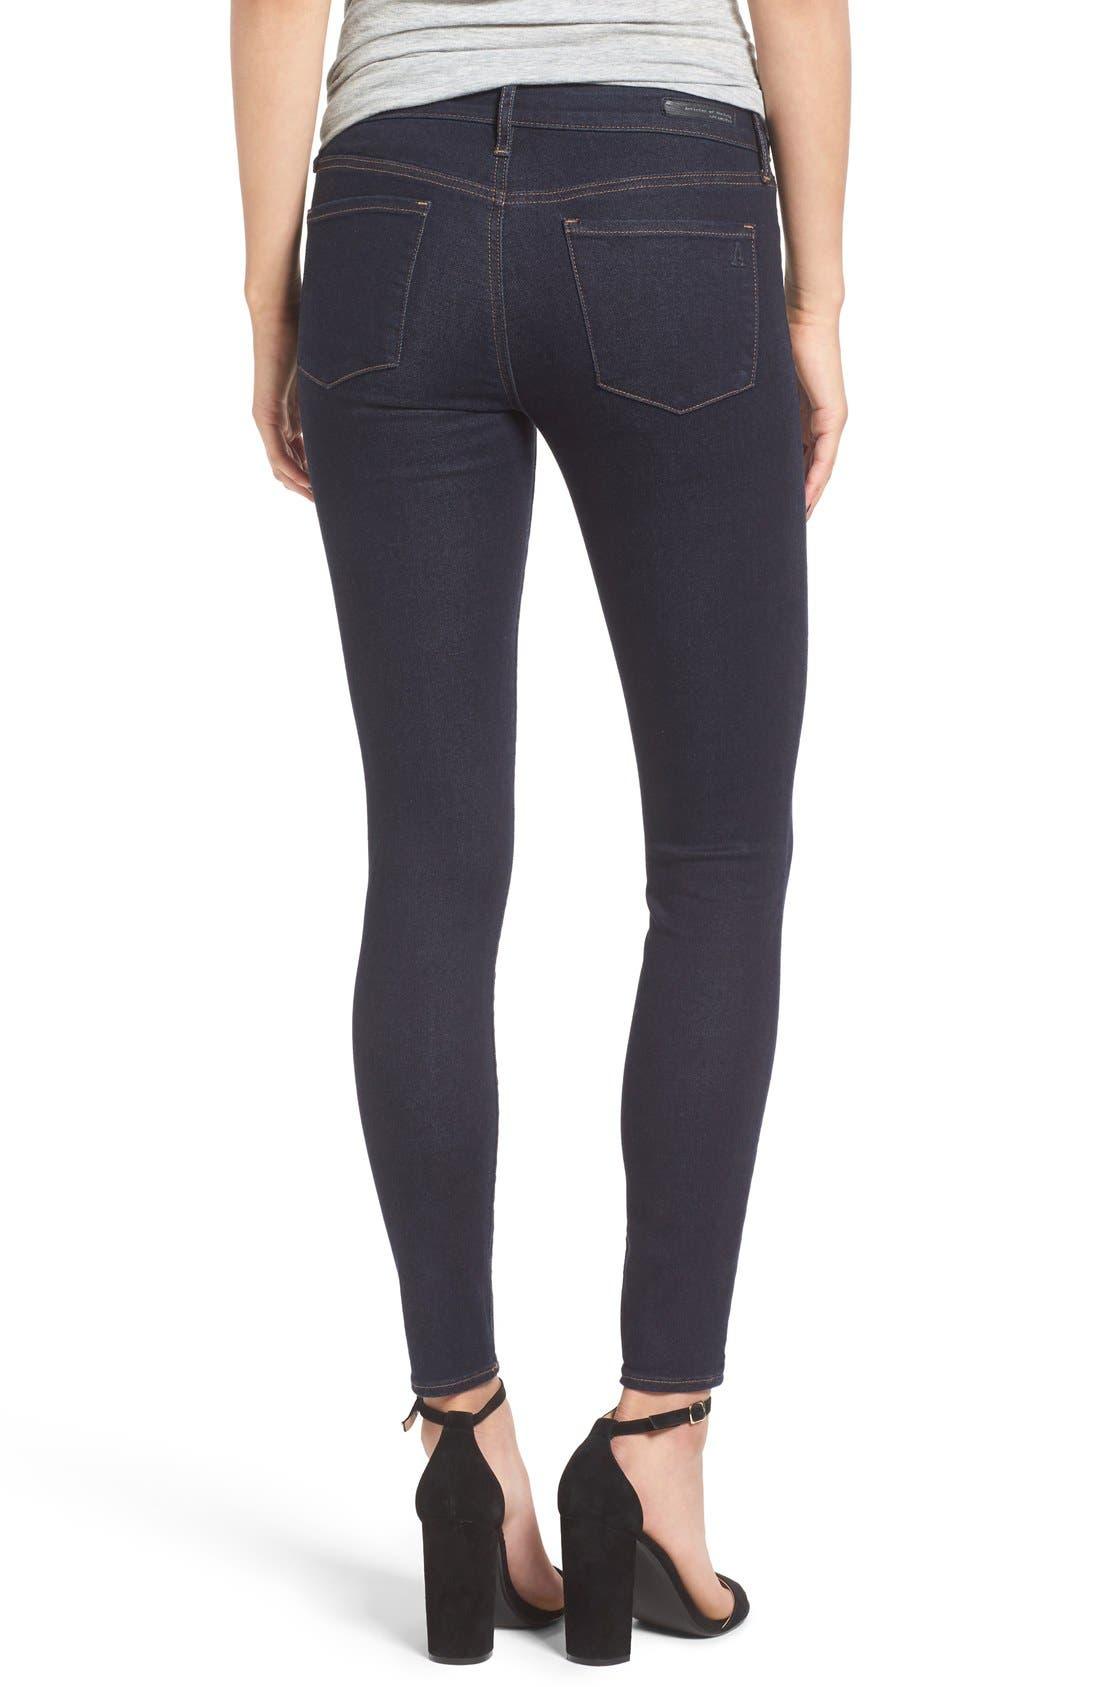 Alternate Image 3  - Articles of Society 'Sarah' Skinny Jeans (Melrose)